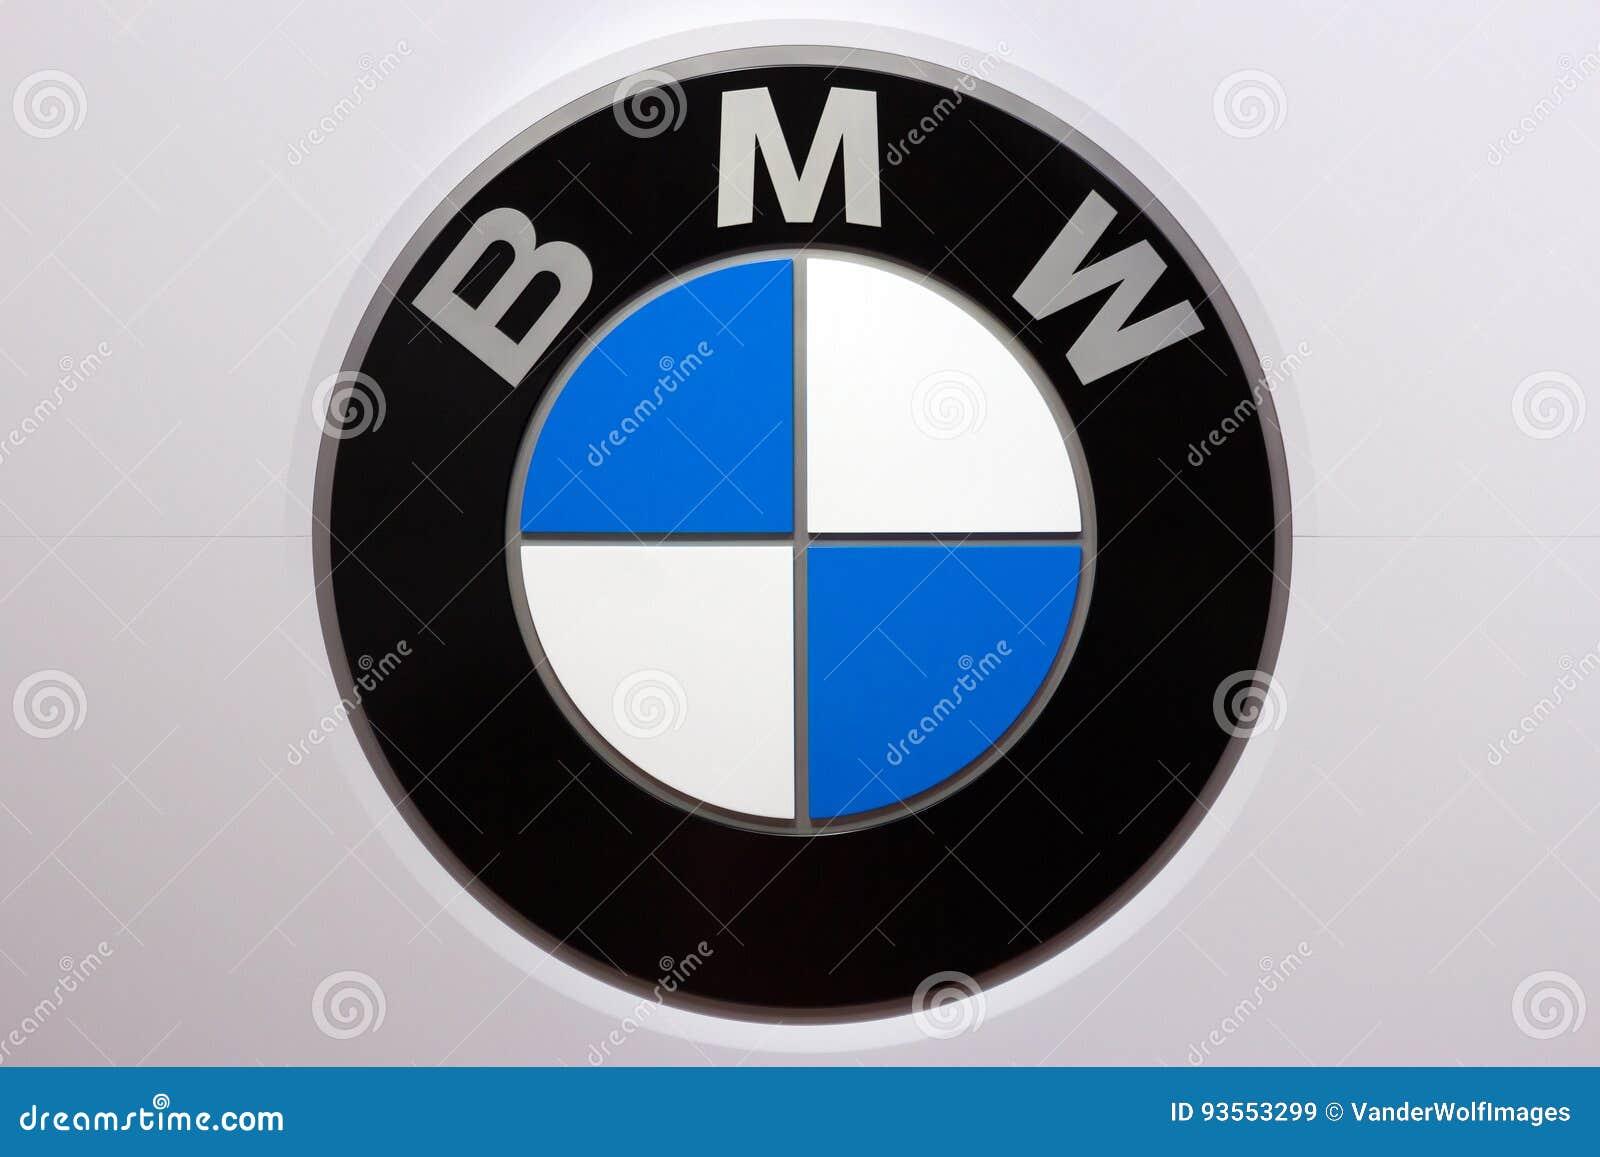 Bmw Symbol Editorial Stock Image Image Of Symbol Business 93553299